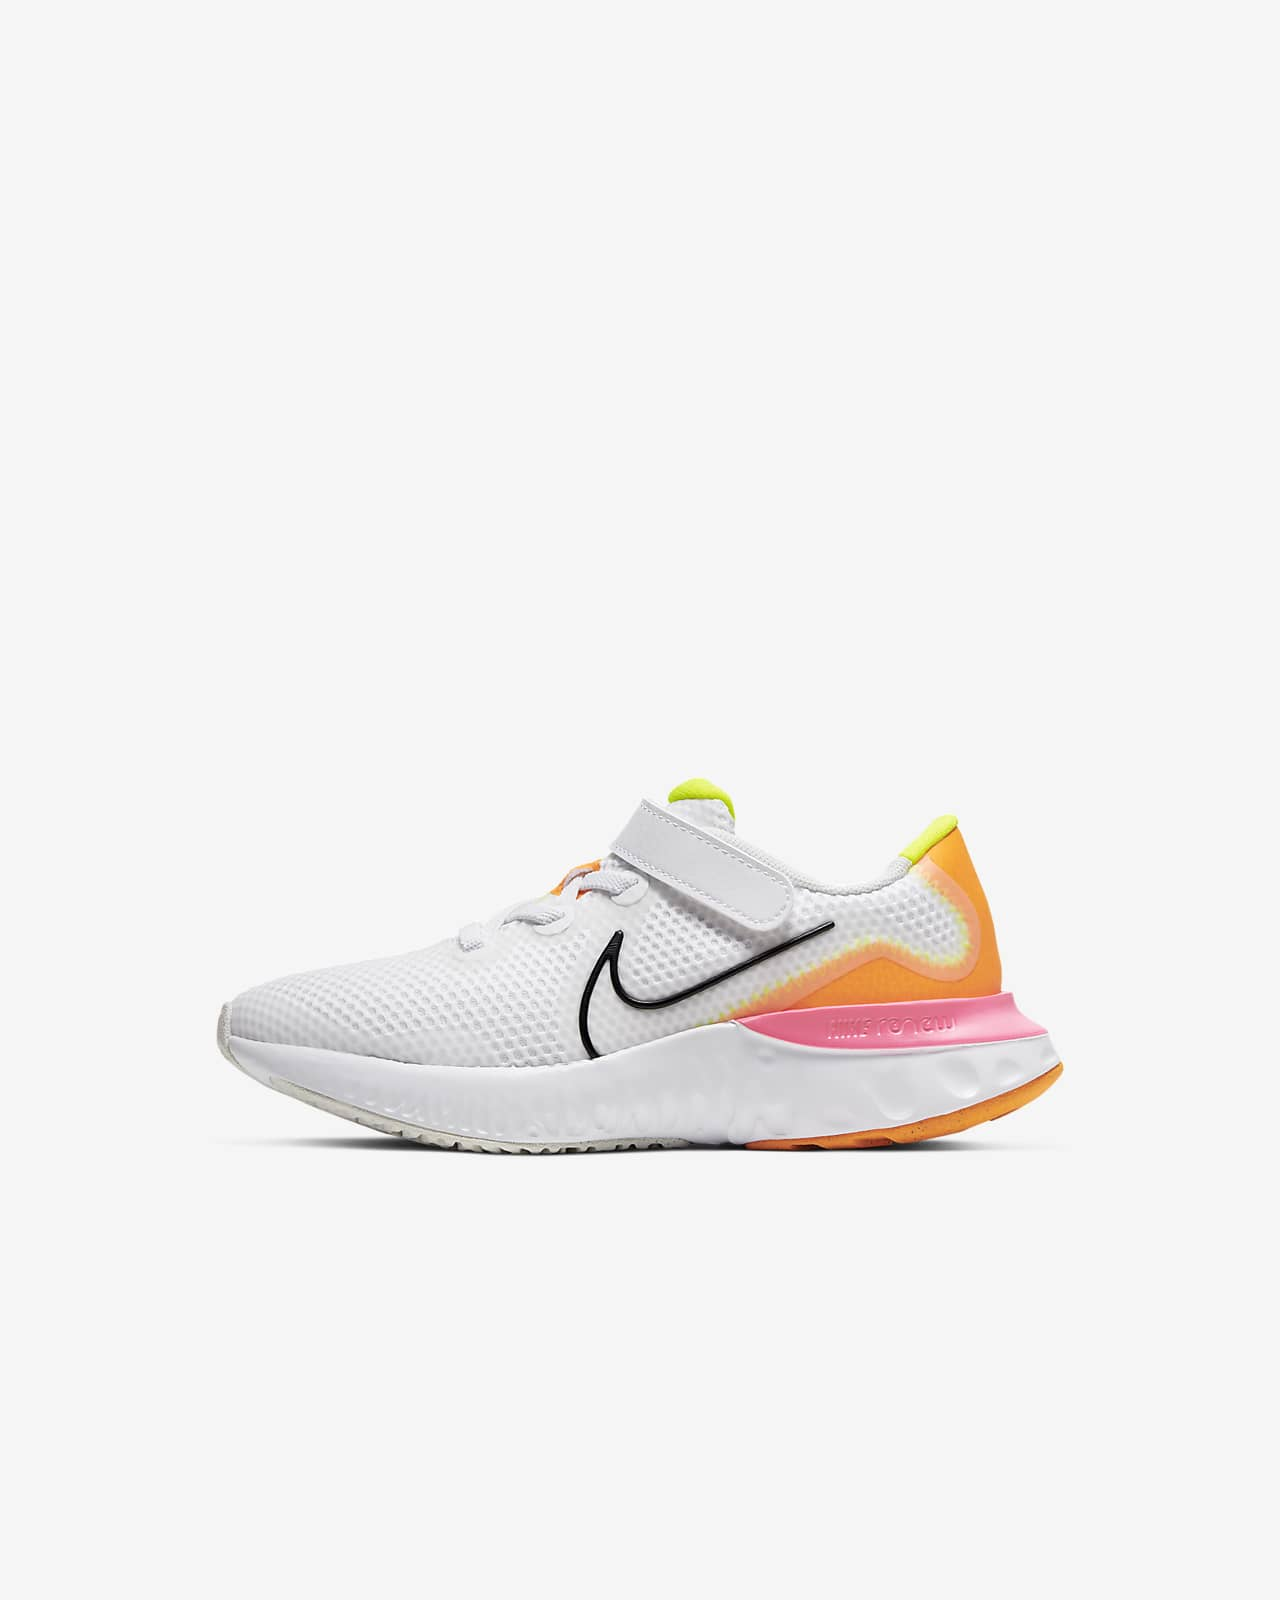 Nike Renew Run (PSV) 幼童运动童鞋